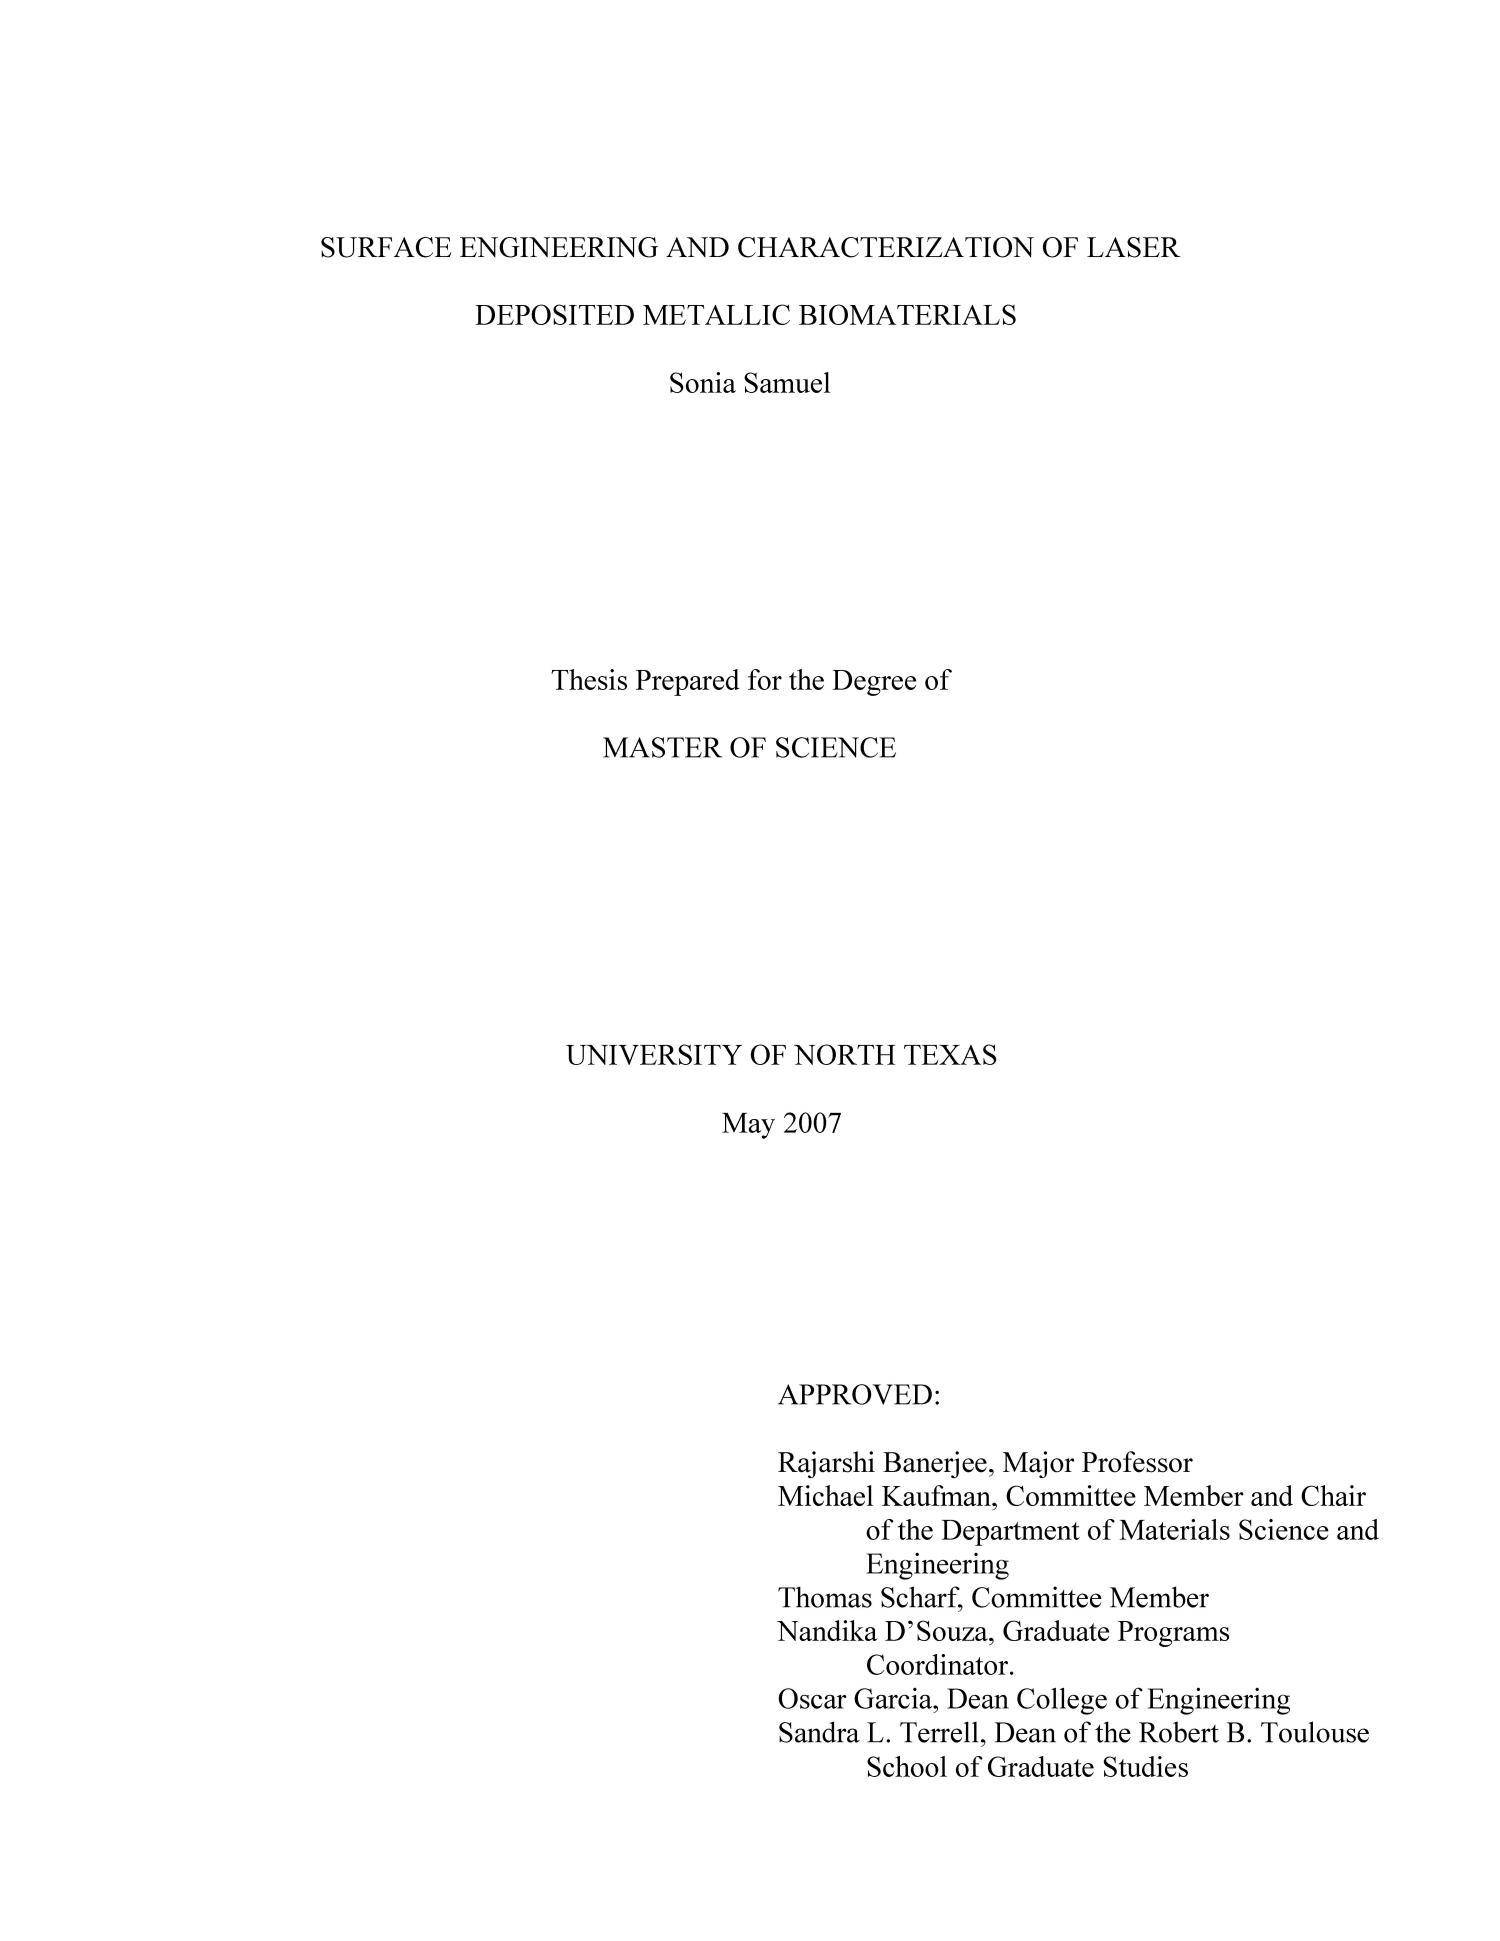 Dissertation sandra scharf